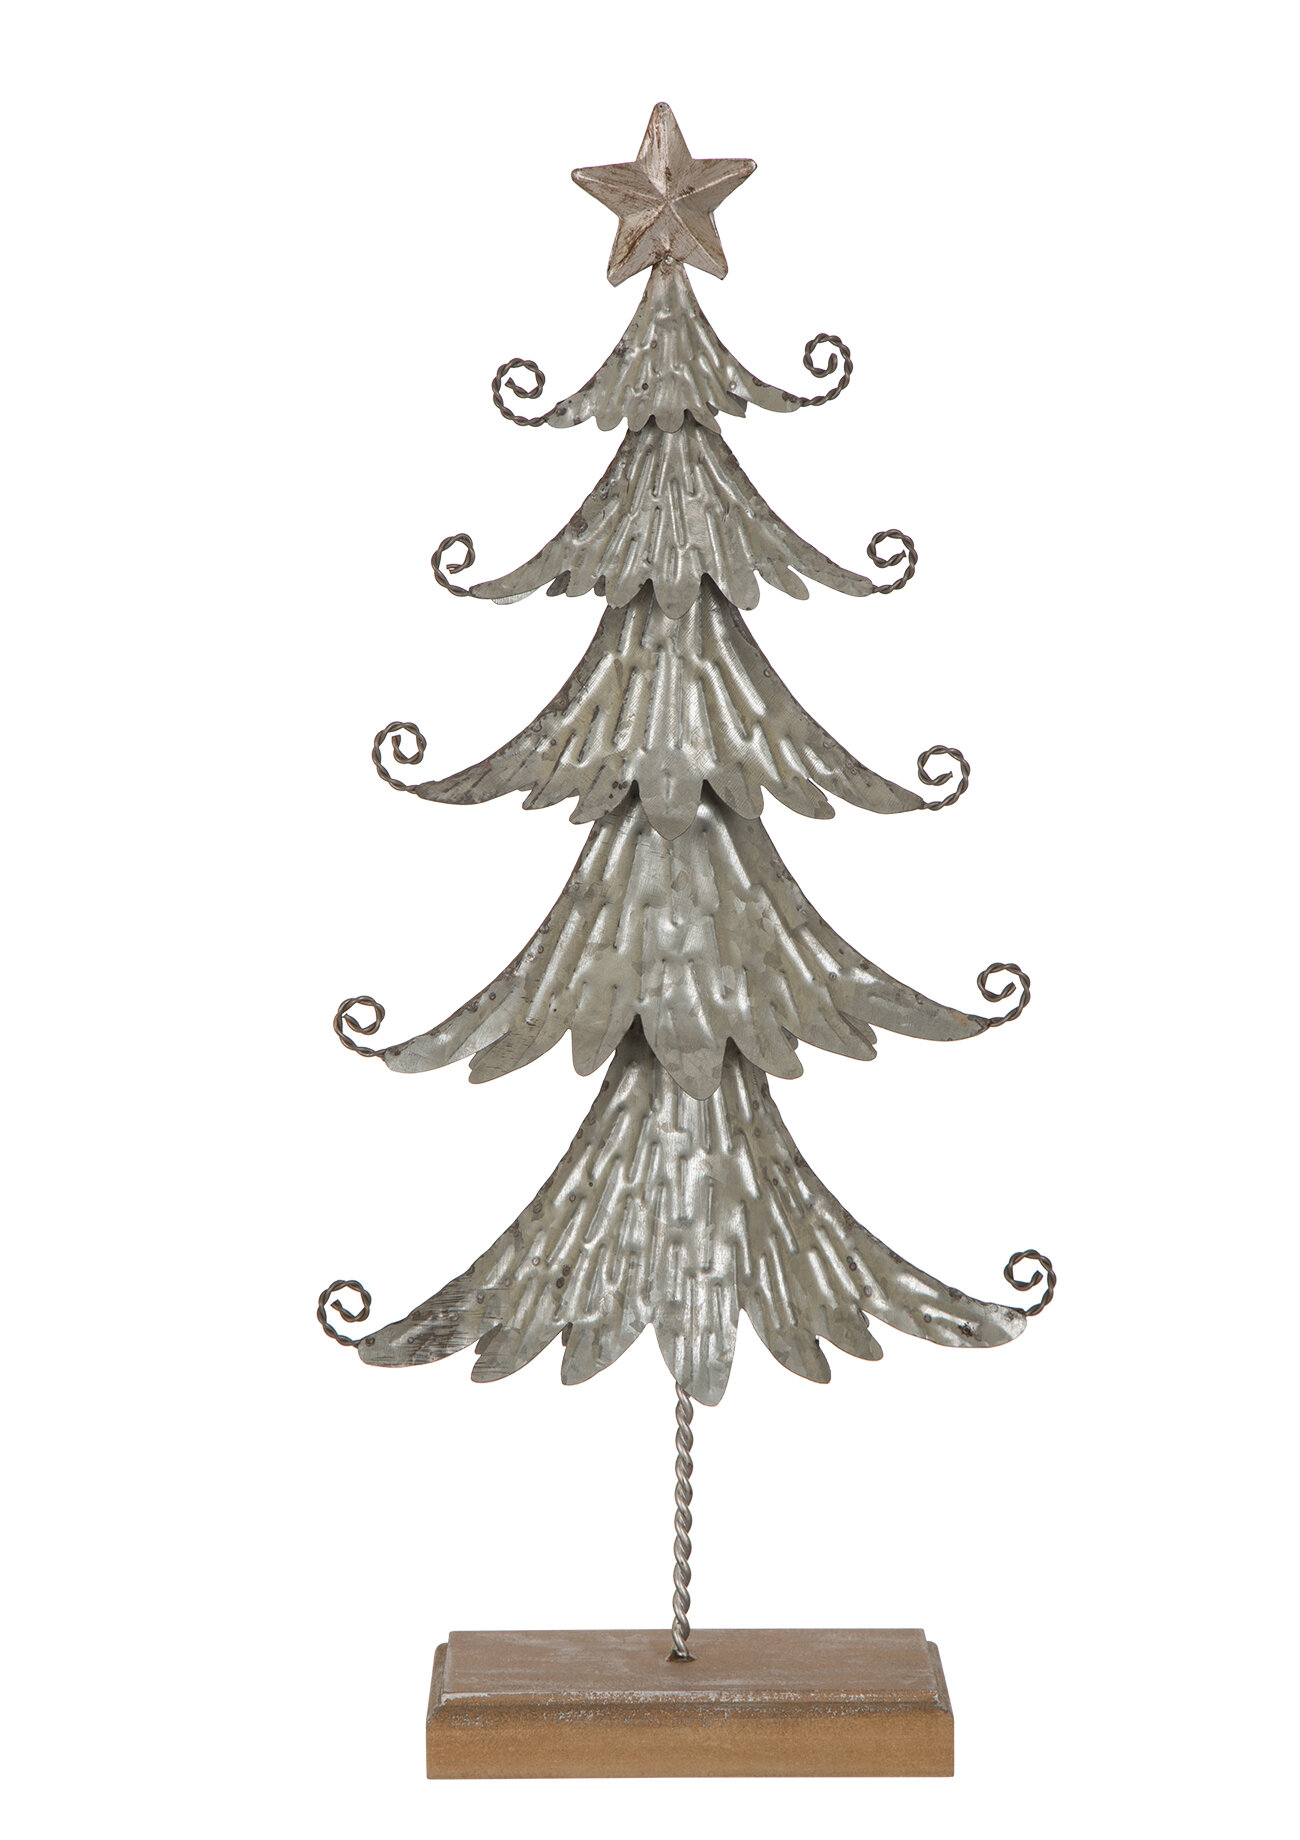 The Holiday Aisle Metal Table Tree